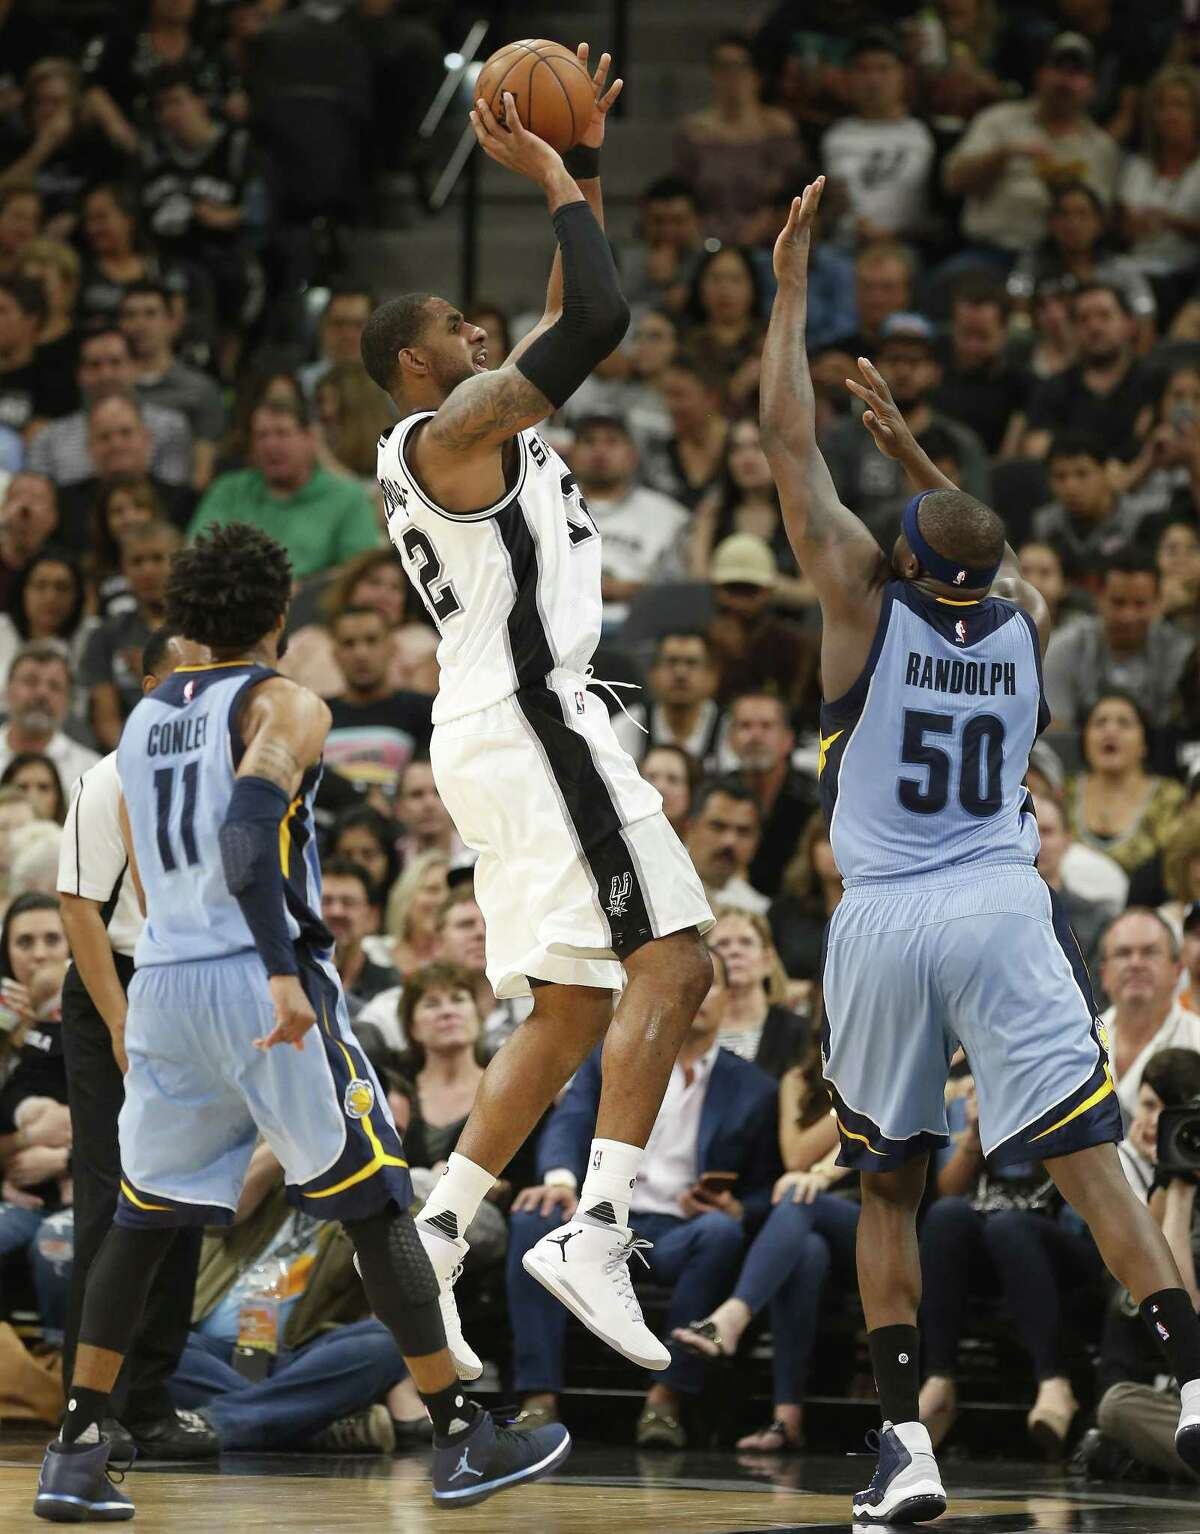 Spurs' LaMarcus Aldridge (12) attempts a shot against the Memphis Grizzlies' Zach Randolph (50) and Mike Conley (11) at the AT&T Center on April 4, 2017.